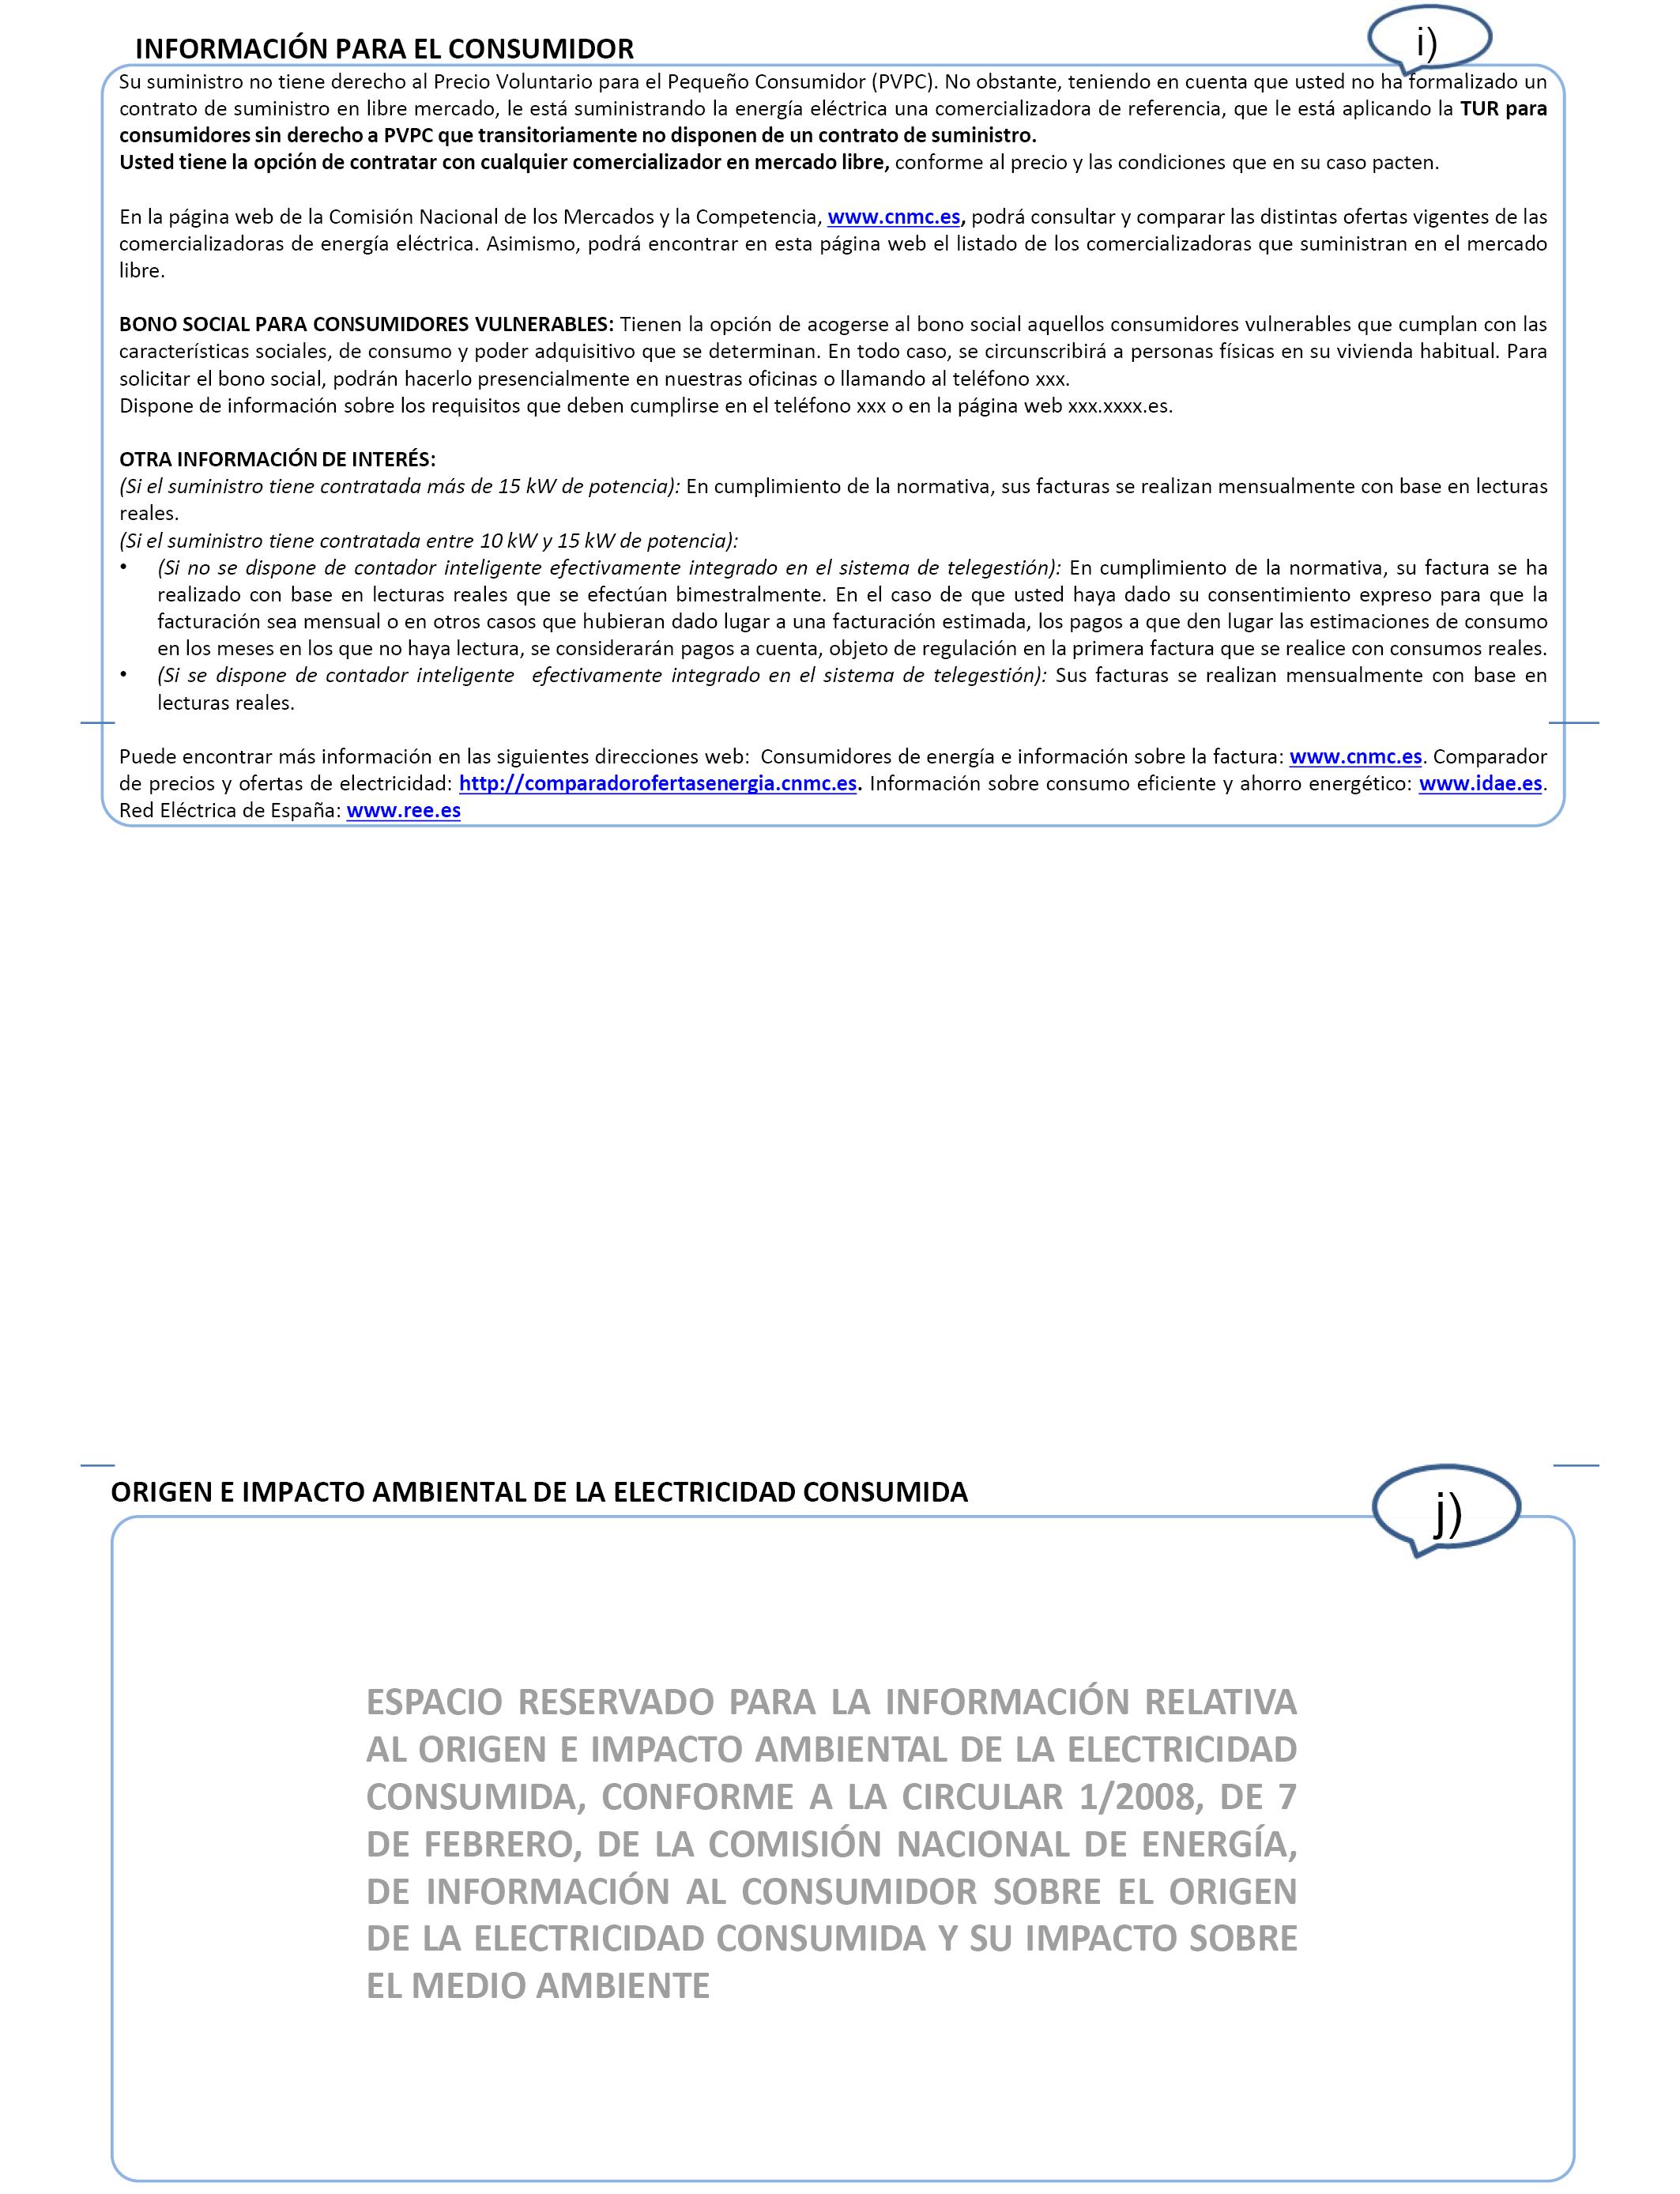 BOE.es - Documento BOE-A-2014-5655